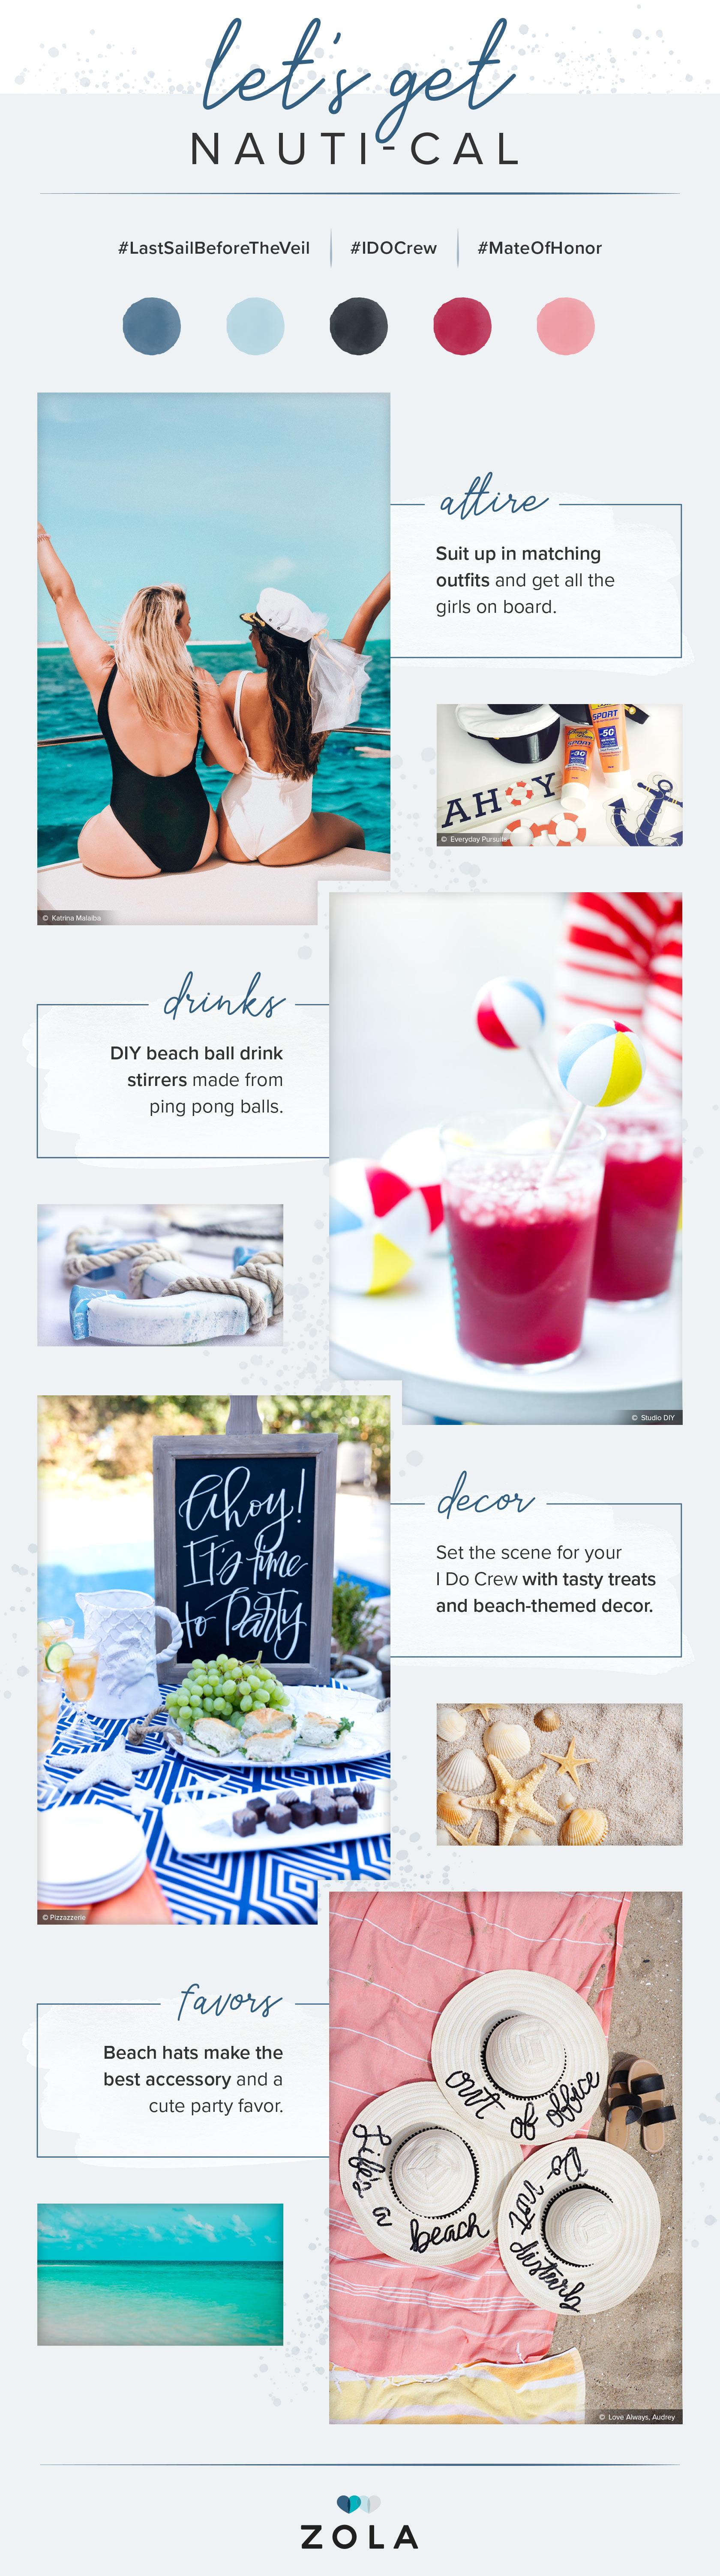 nautical bachelorette party ideas.jpg